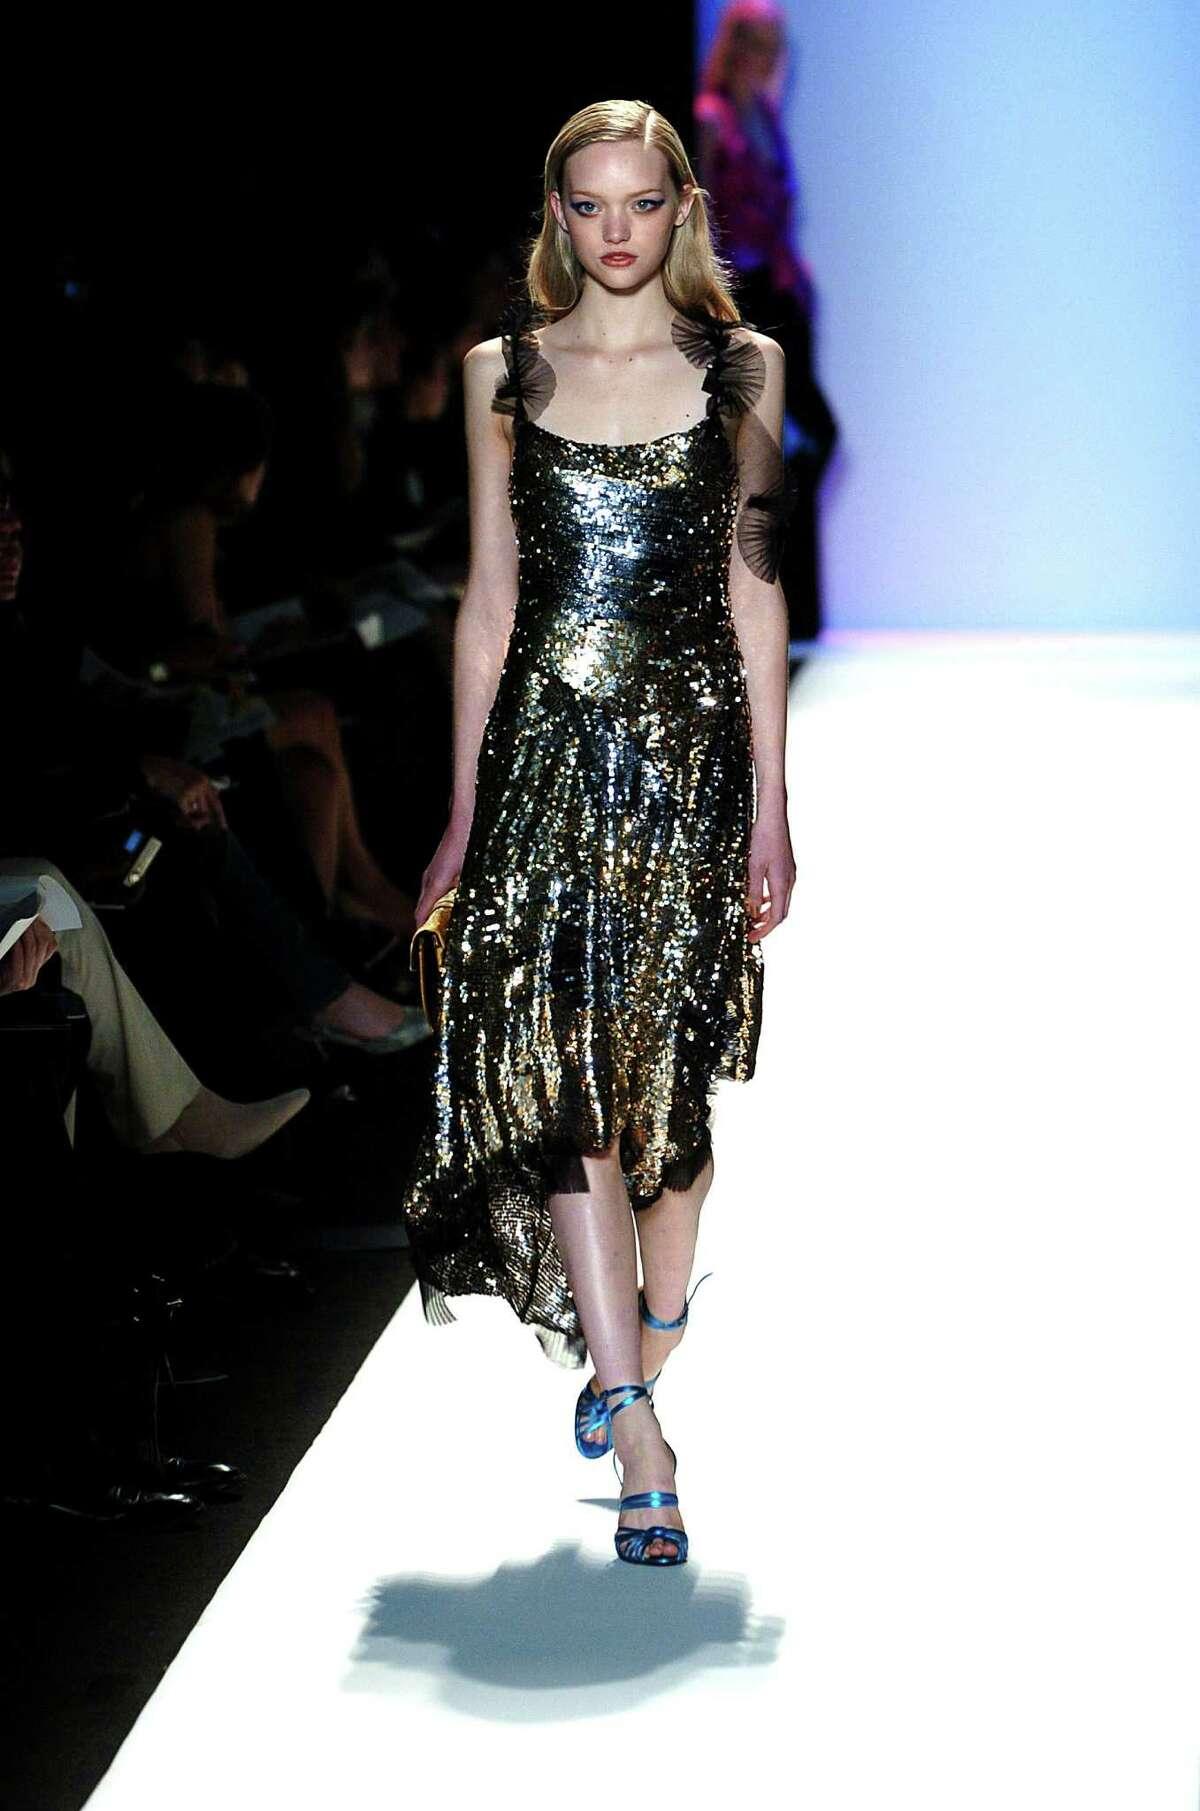 A model walks the runway at the BCBG Max Azria fashion show.